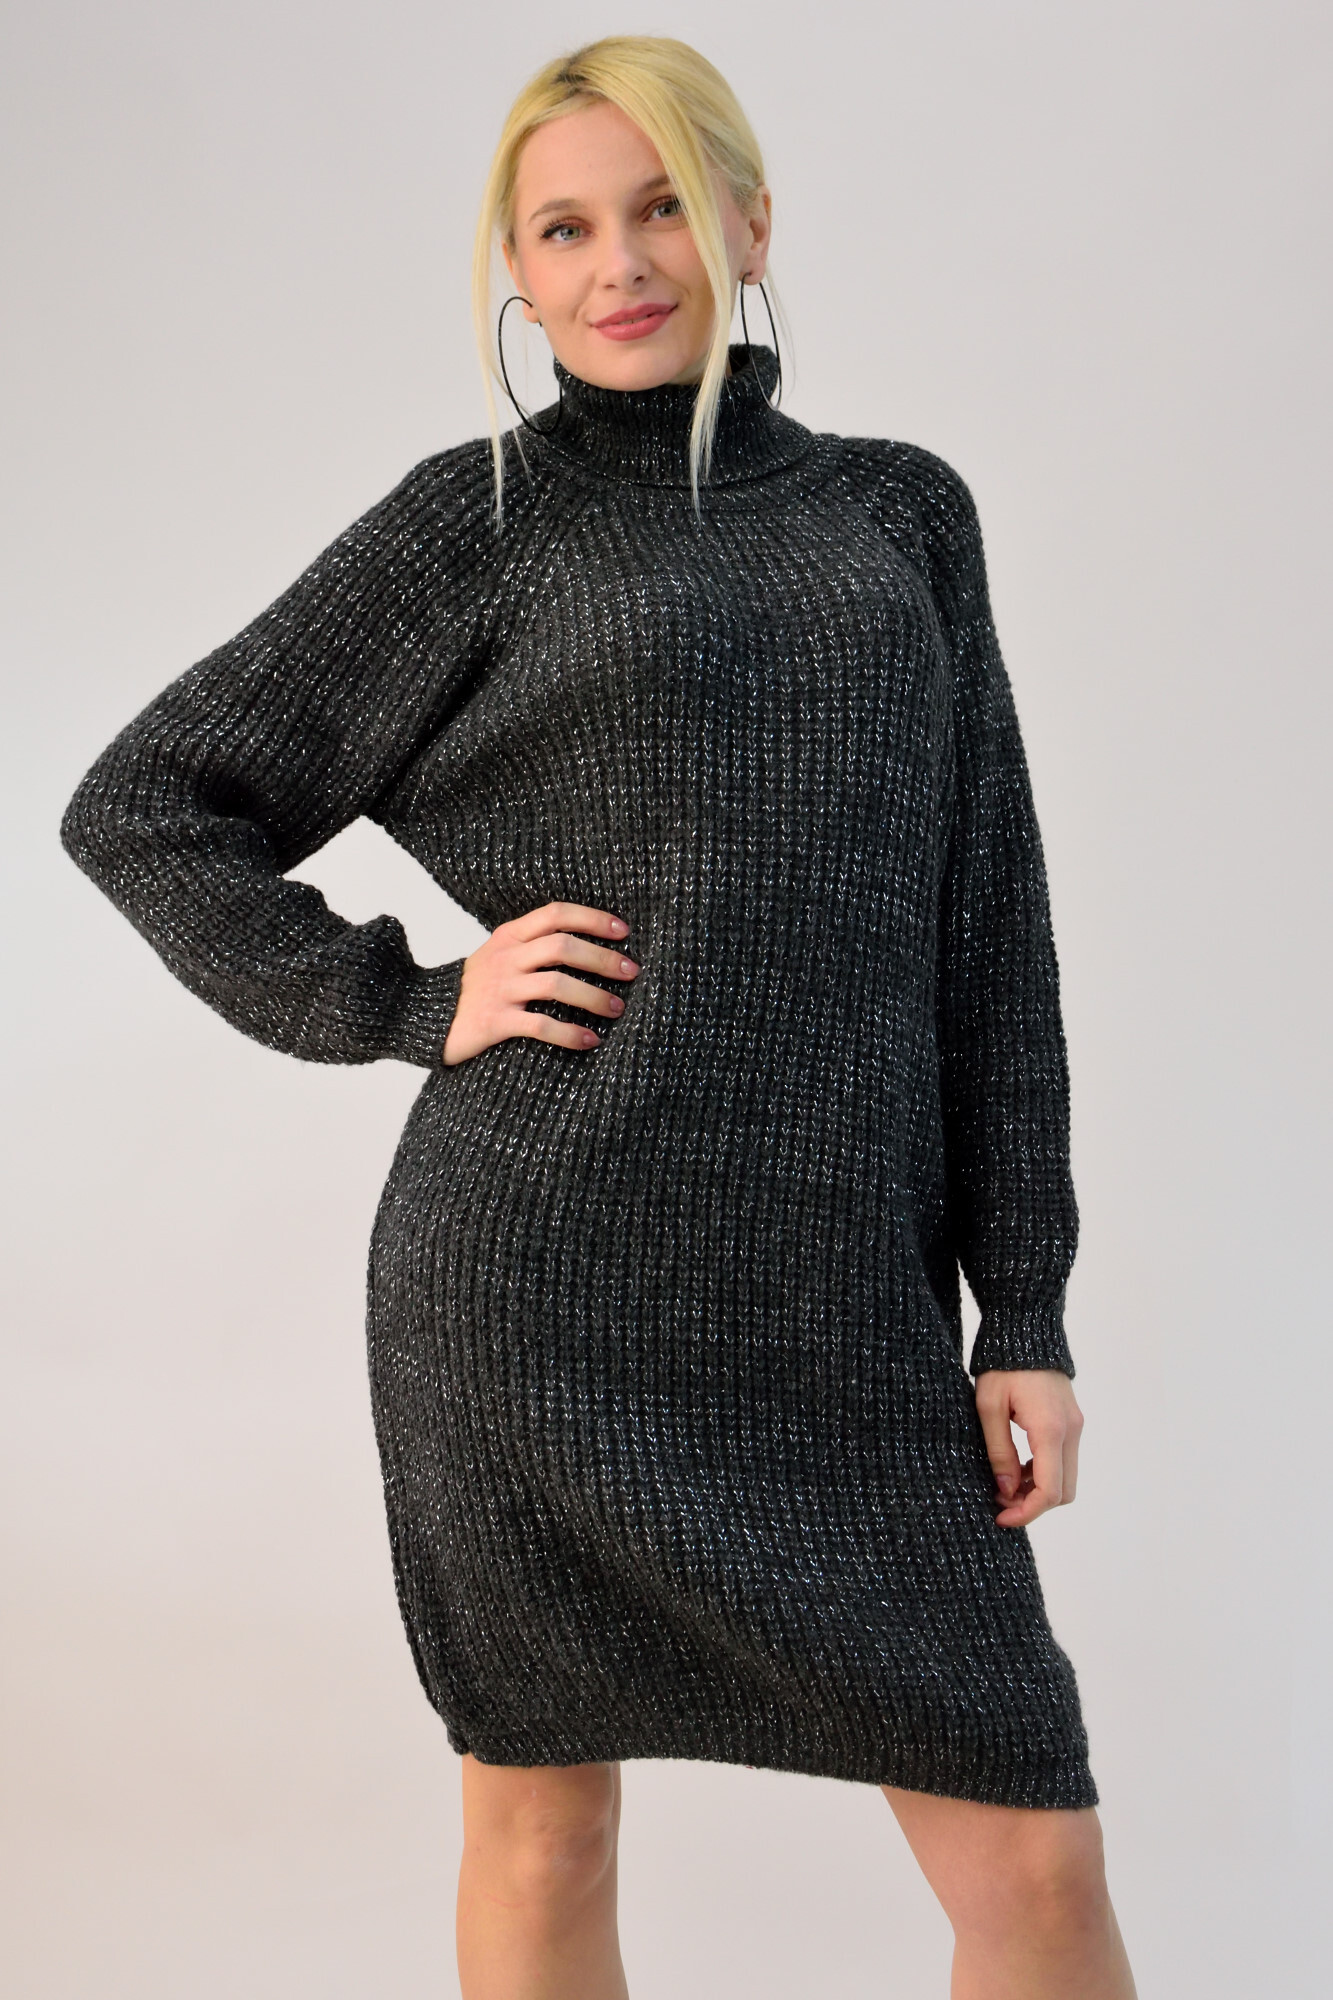 9bbd19350aea Πλεκτό φόρεμα ζιβάγκο λούρεξ. Tap to expand